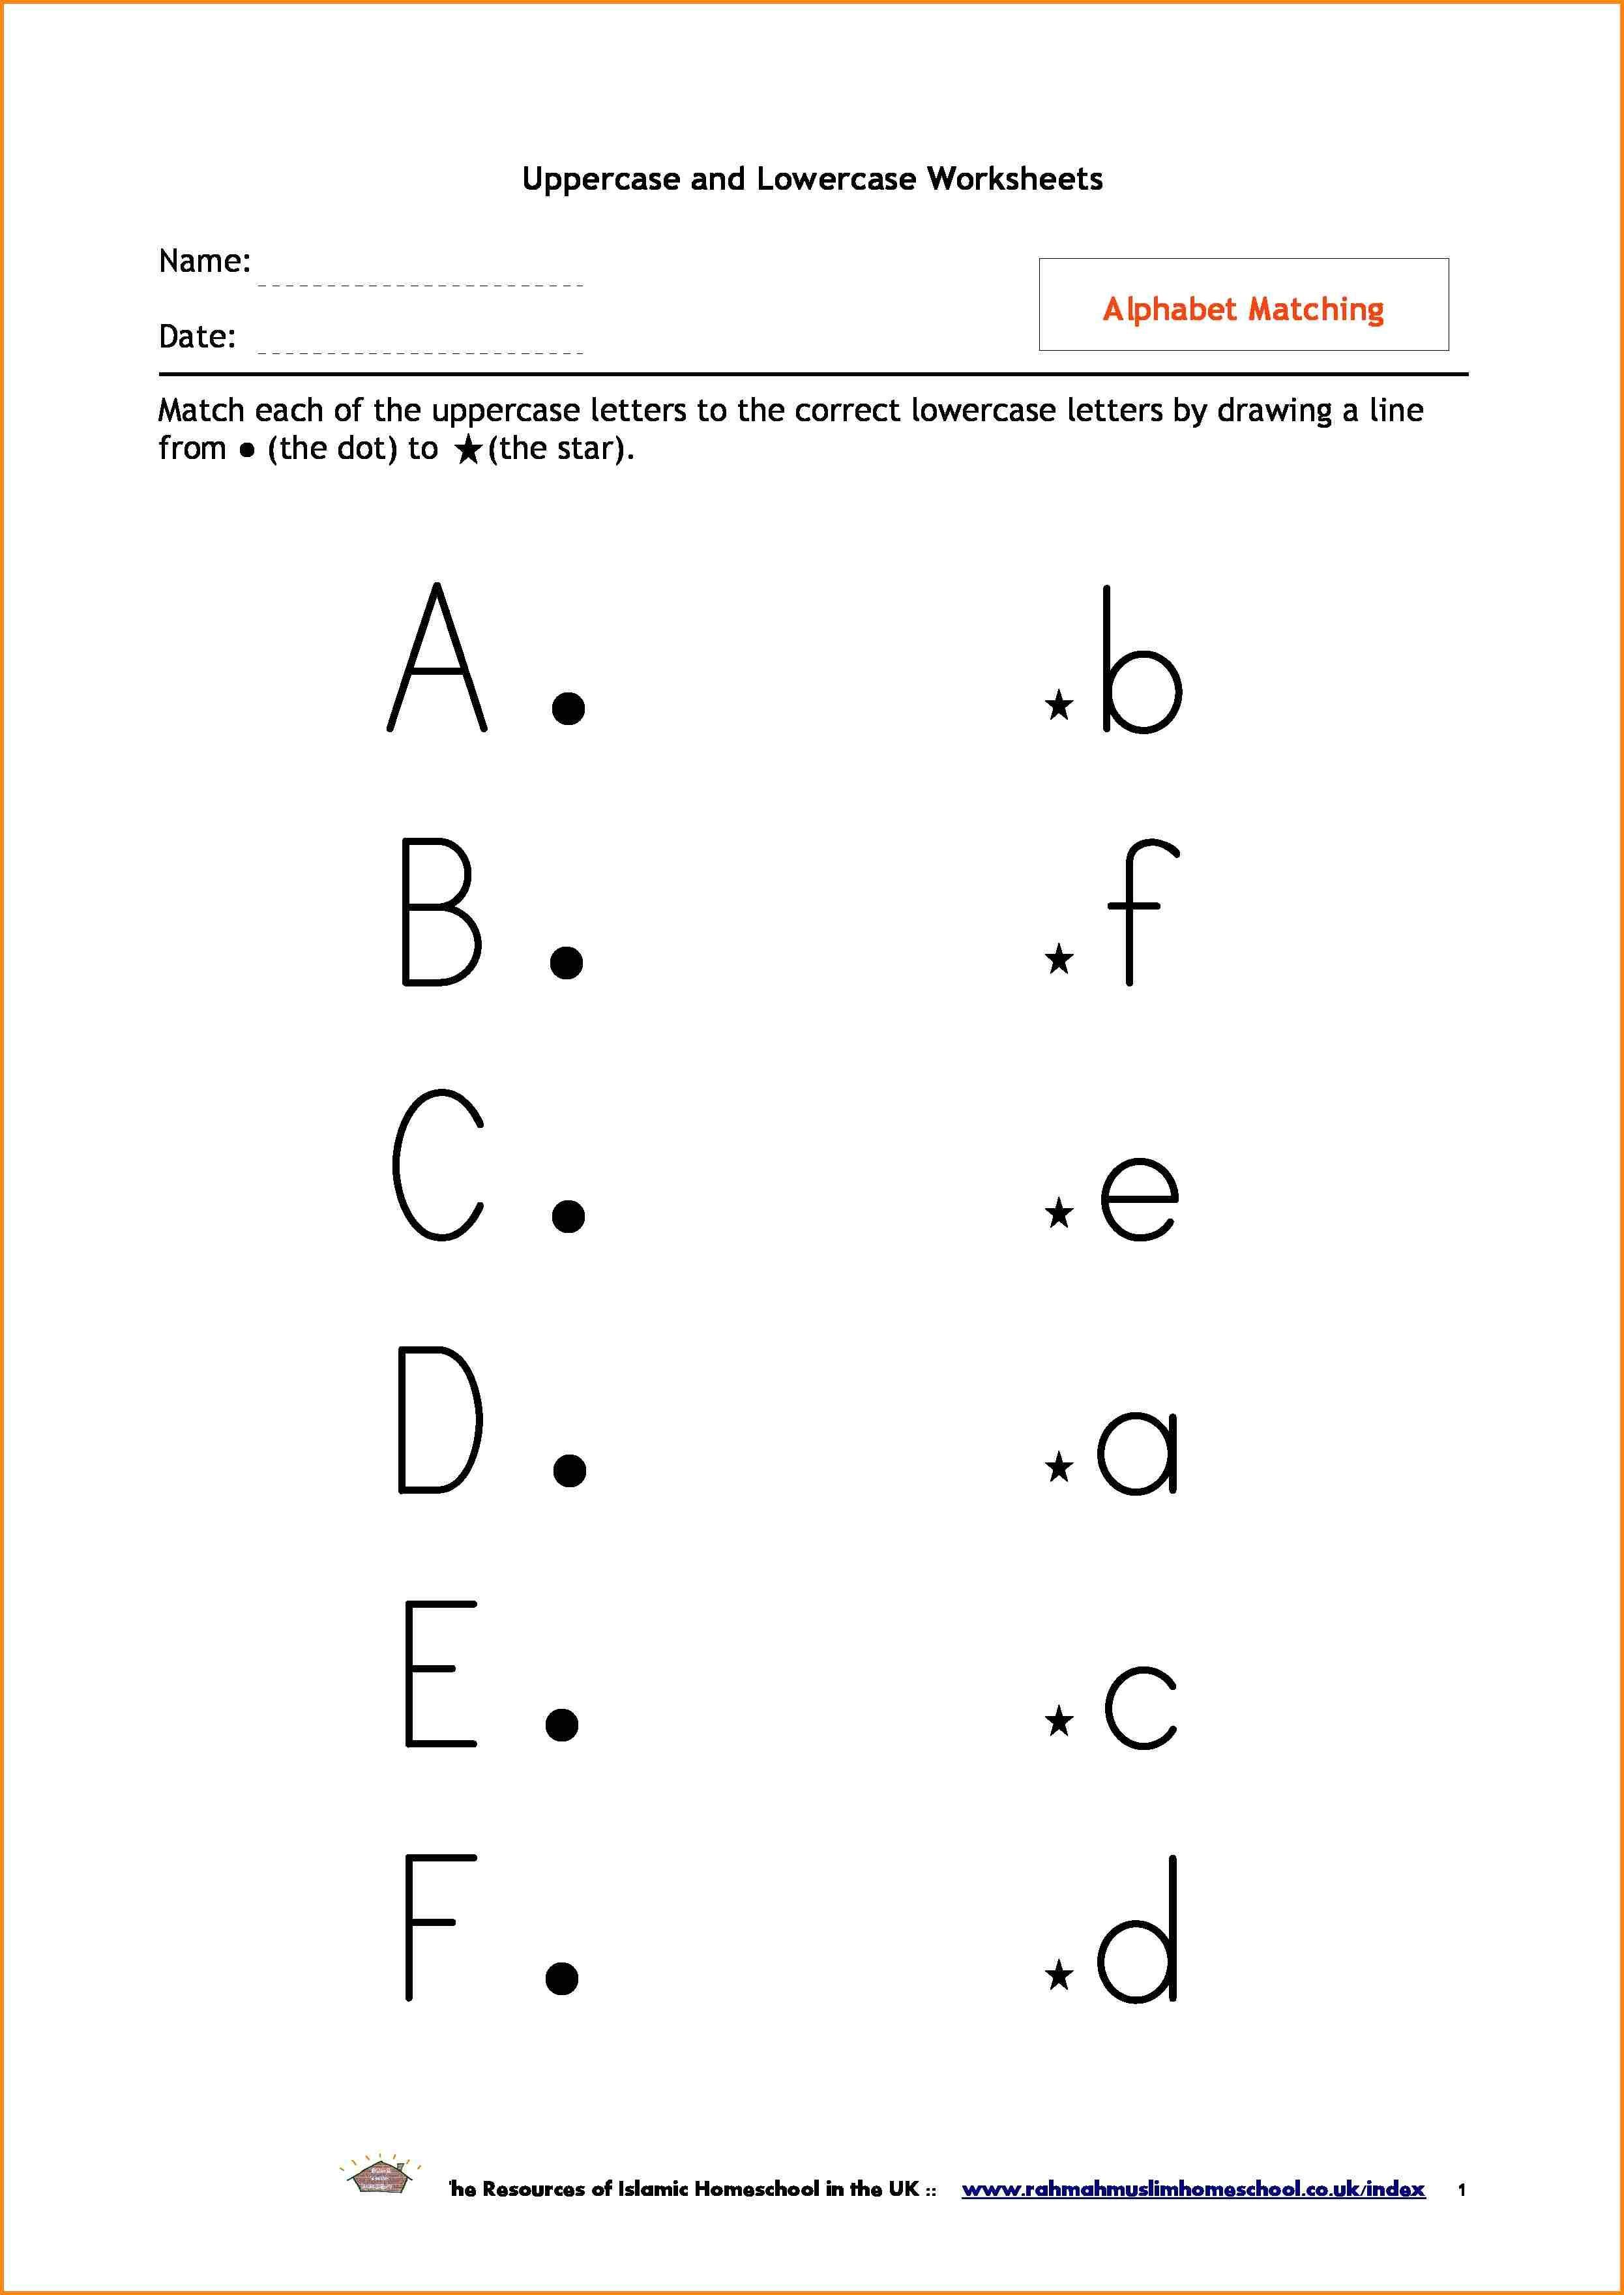 Letters Matching Worksheets Worksheets For All Alphabet Letter Worksheets Lowercase Letters Printable Letter Recognition Worksheets